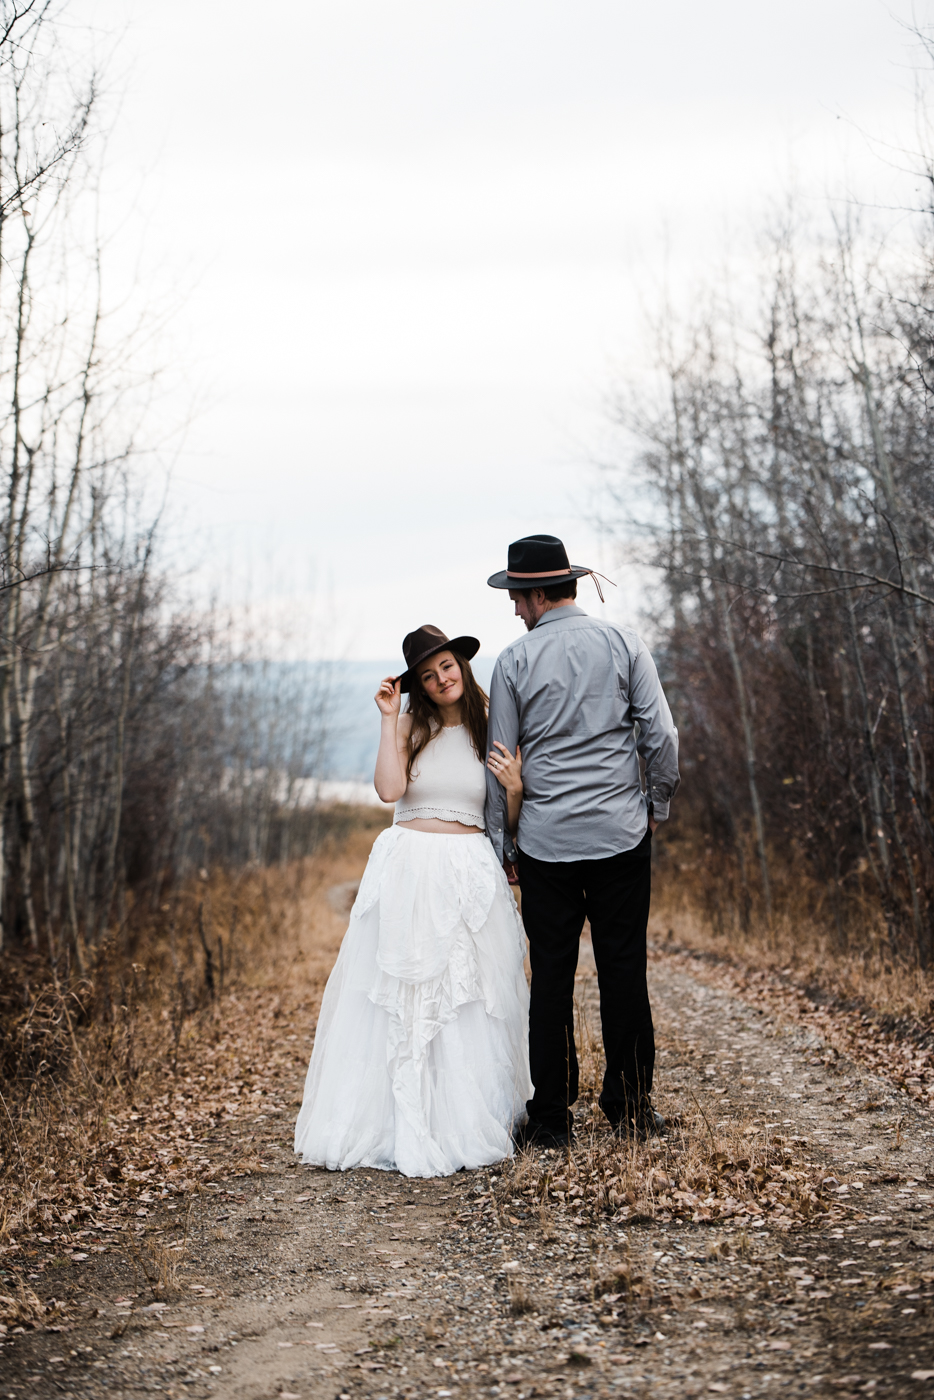 FortSt.John_photographer_TyraEPhotography_Wedding_Couple_Family_Photograhy_DawsonCreek_Elopement_Bride_Boduoir_Portraits-30.jpg